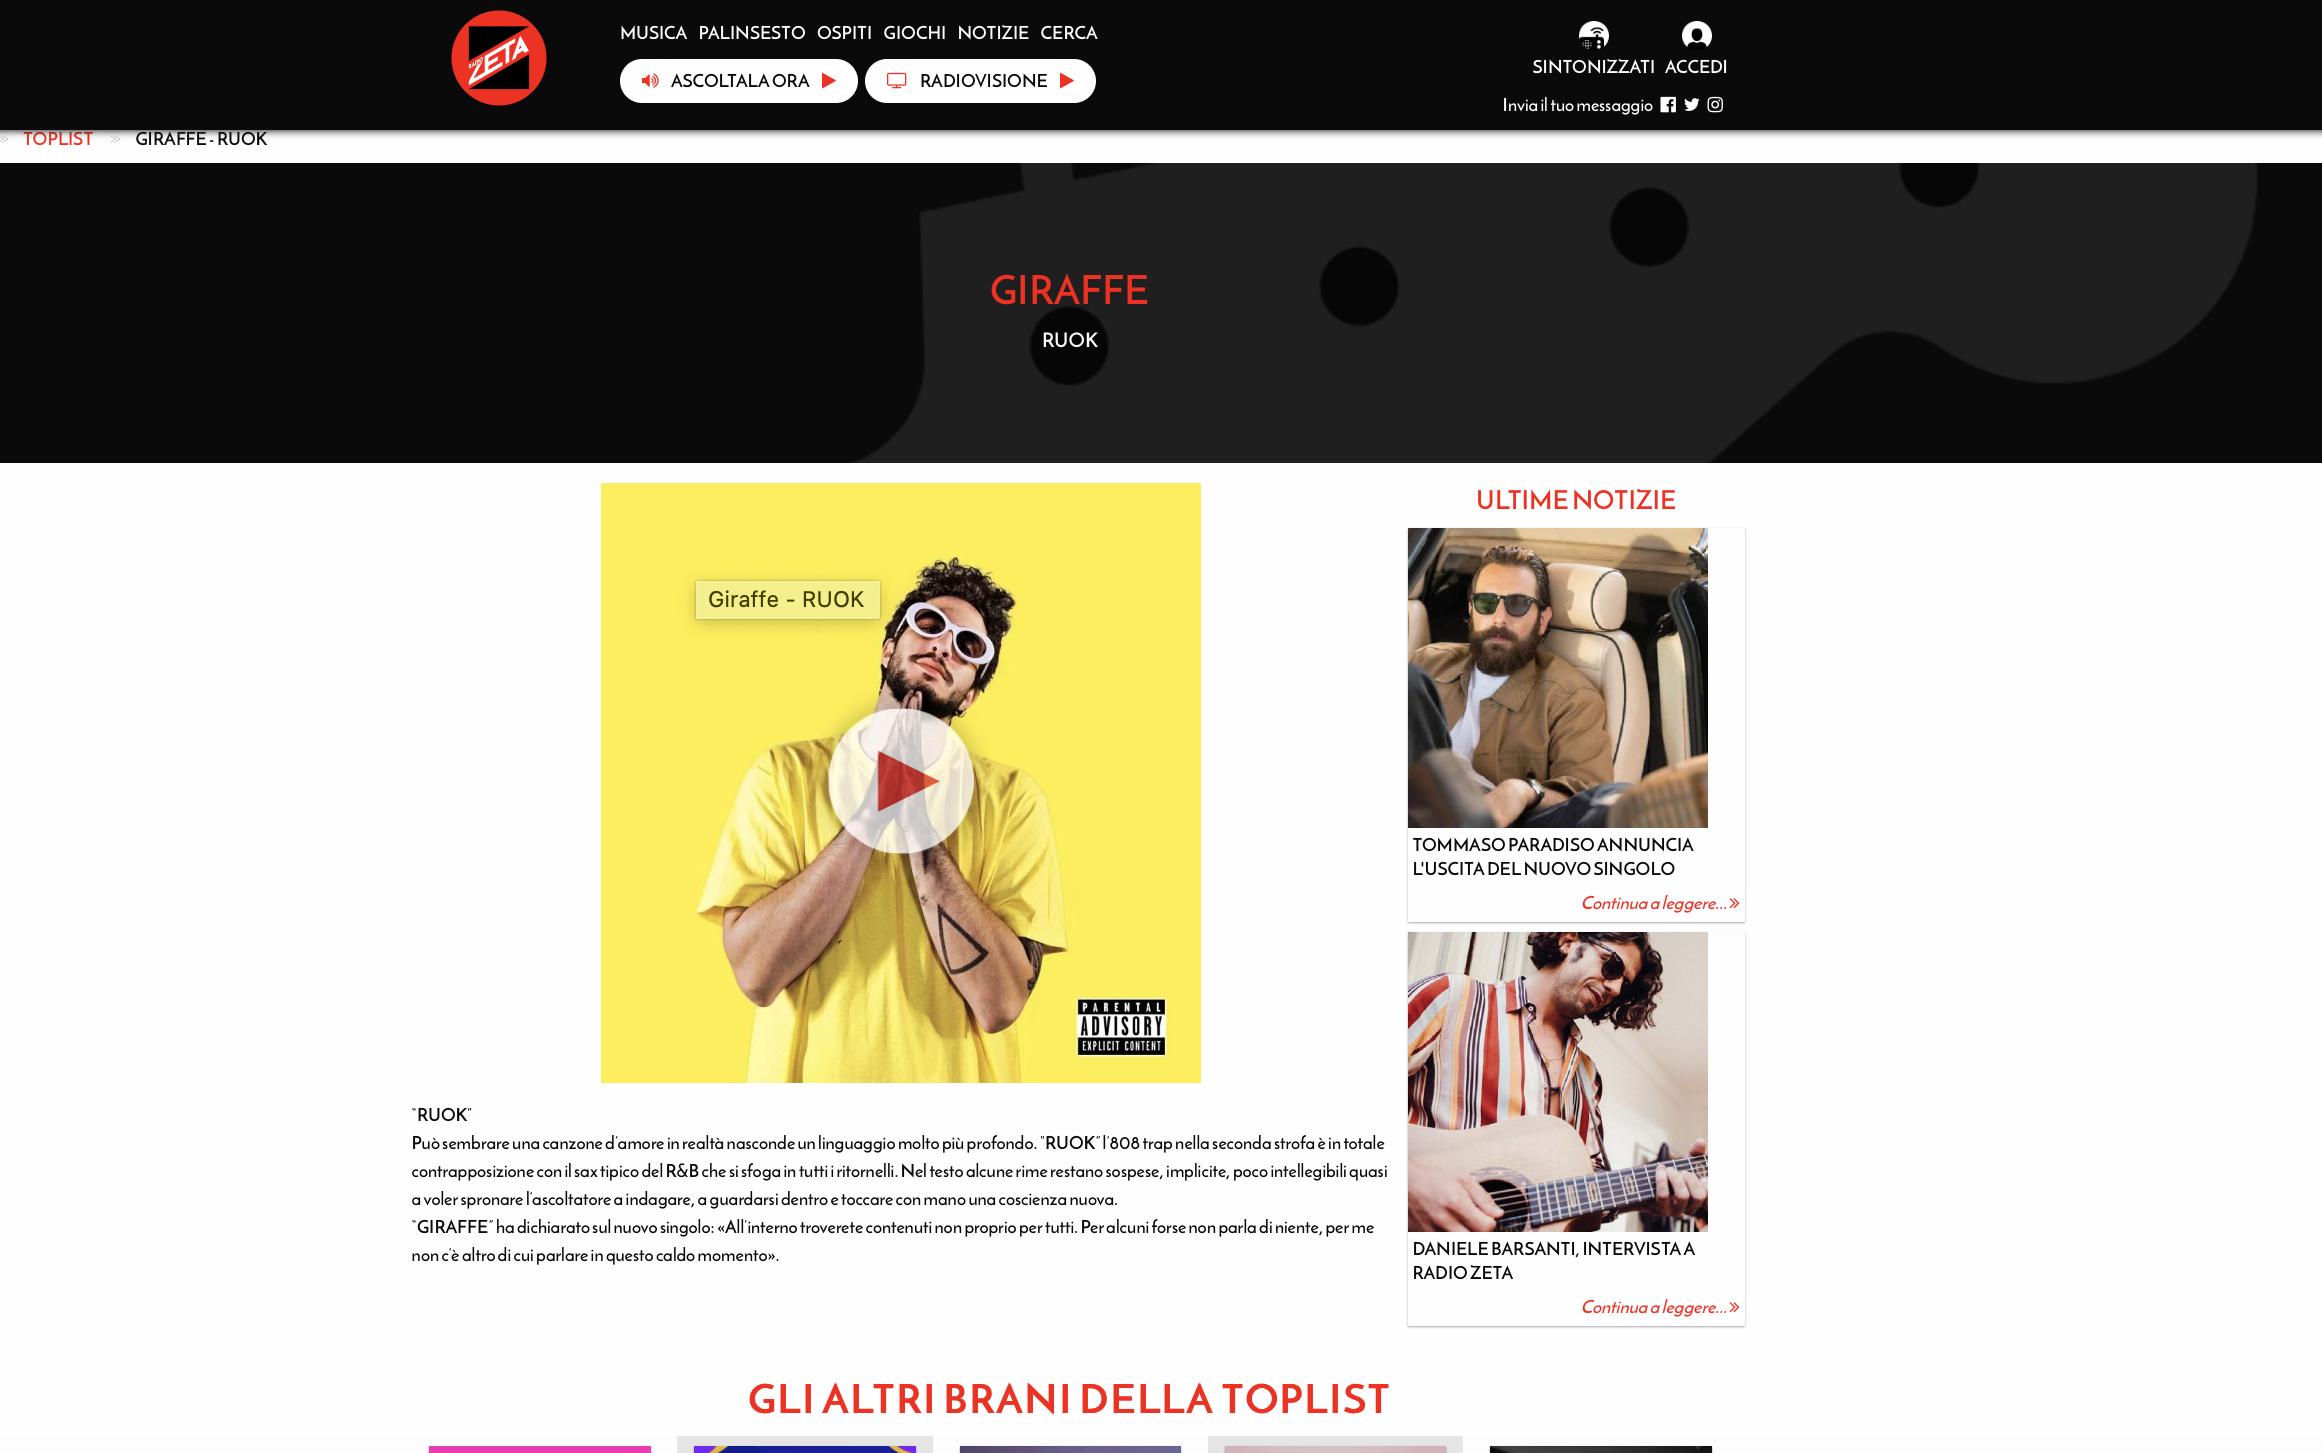 GIRAFFE Radio Zeta